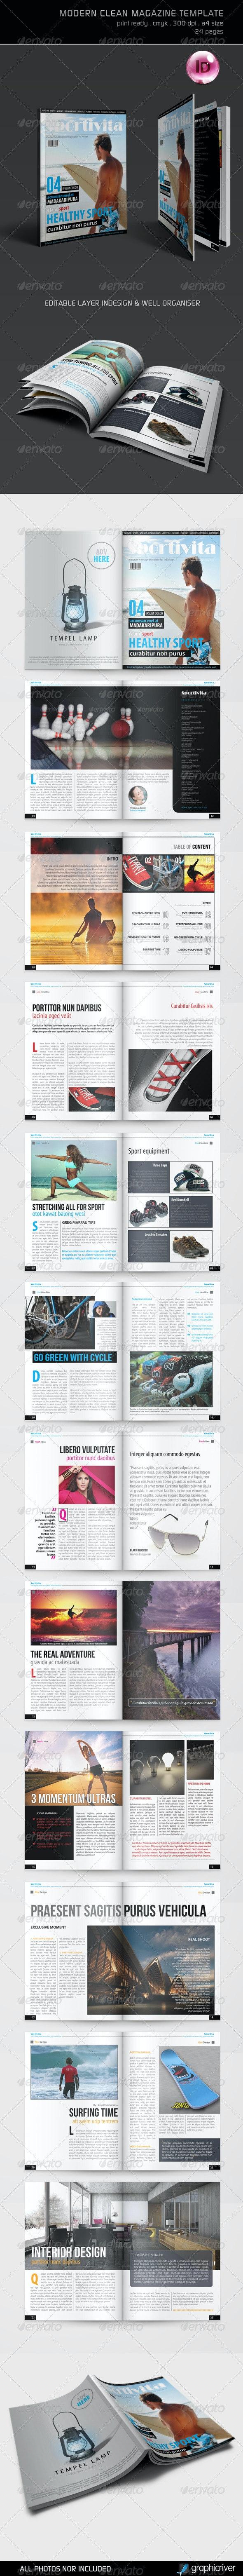 Modern Clean Magazine Template - Magazines Print Templates